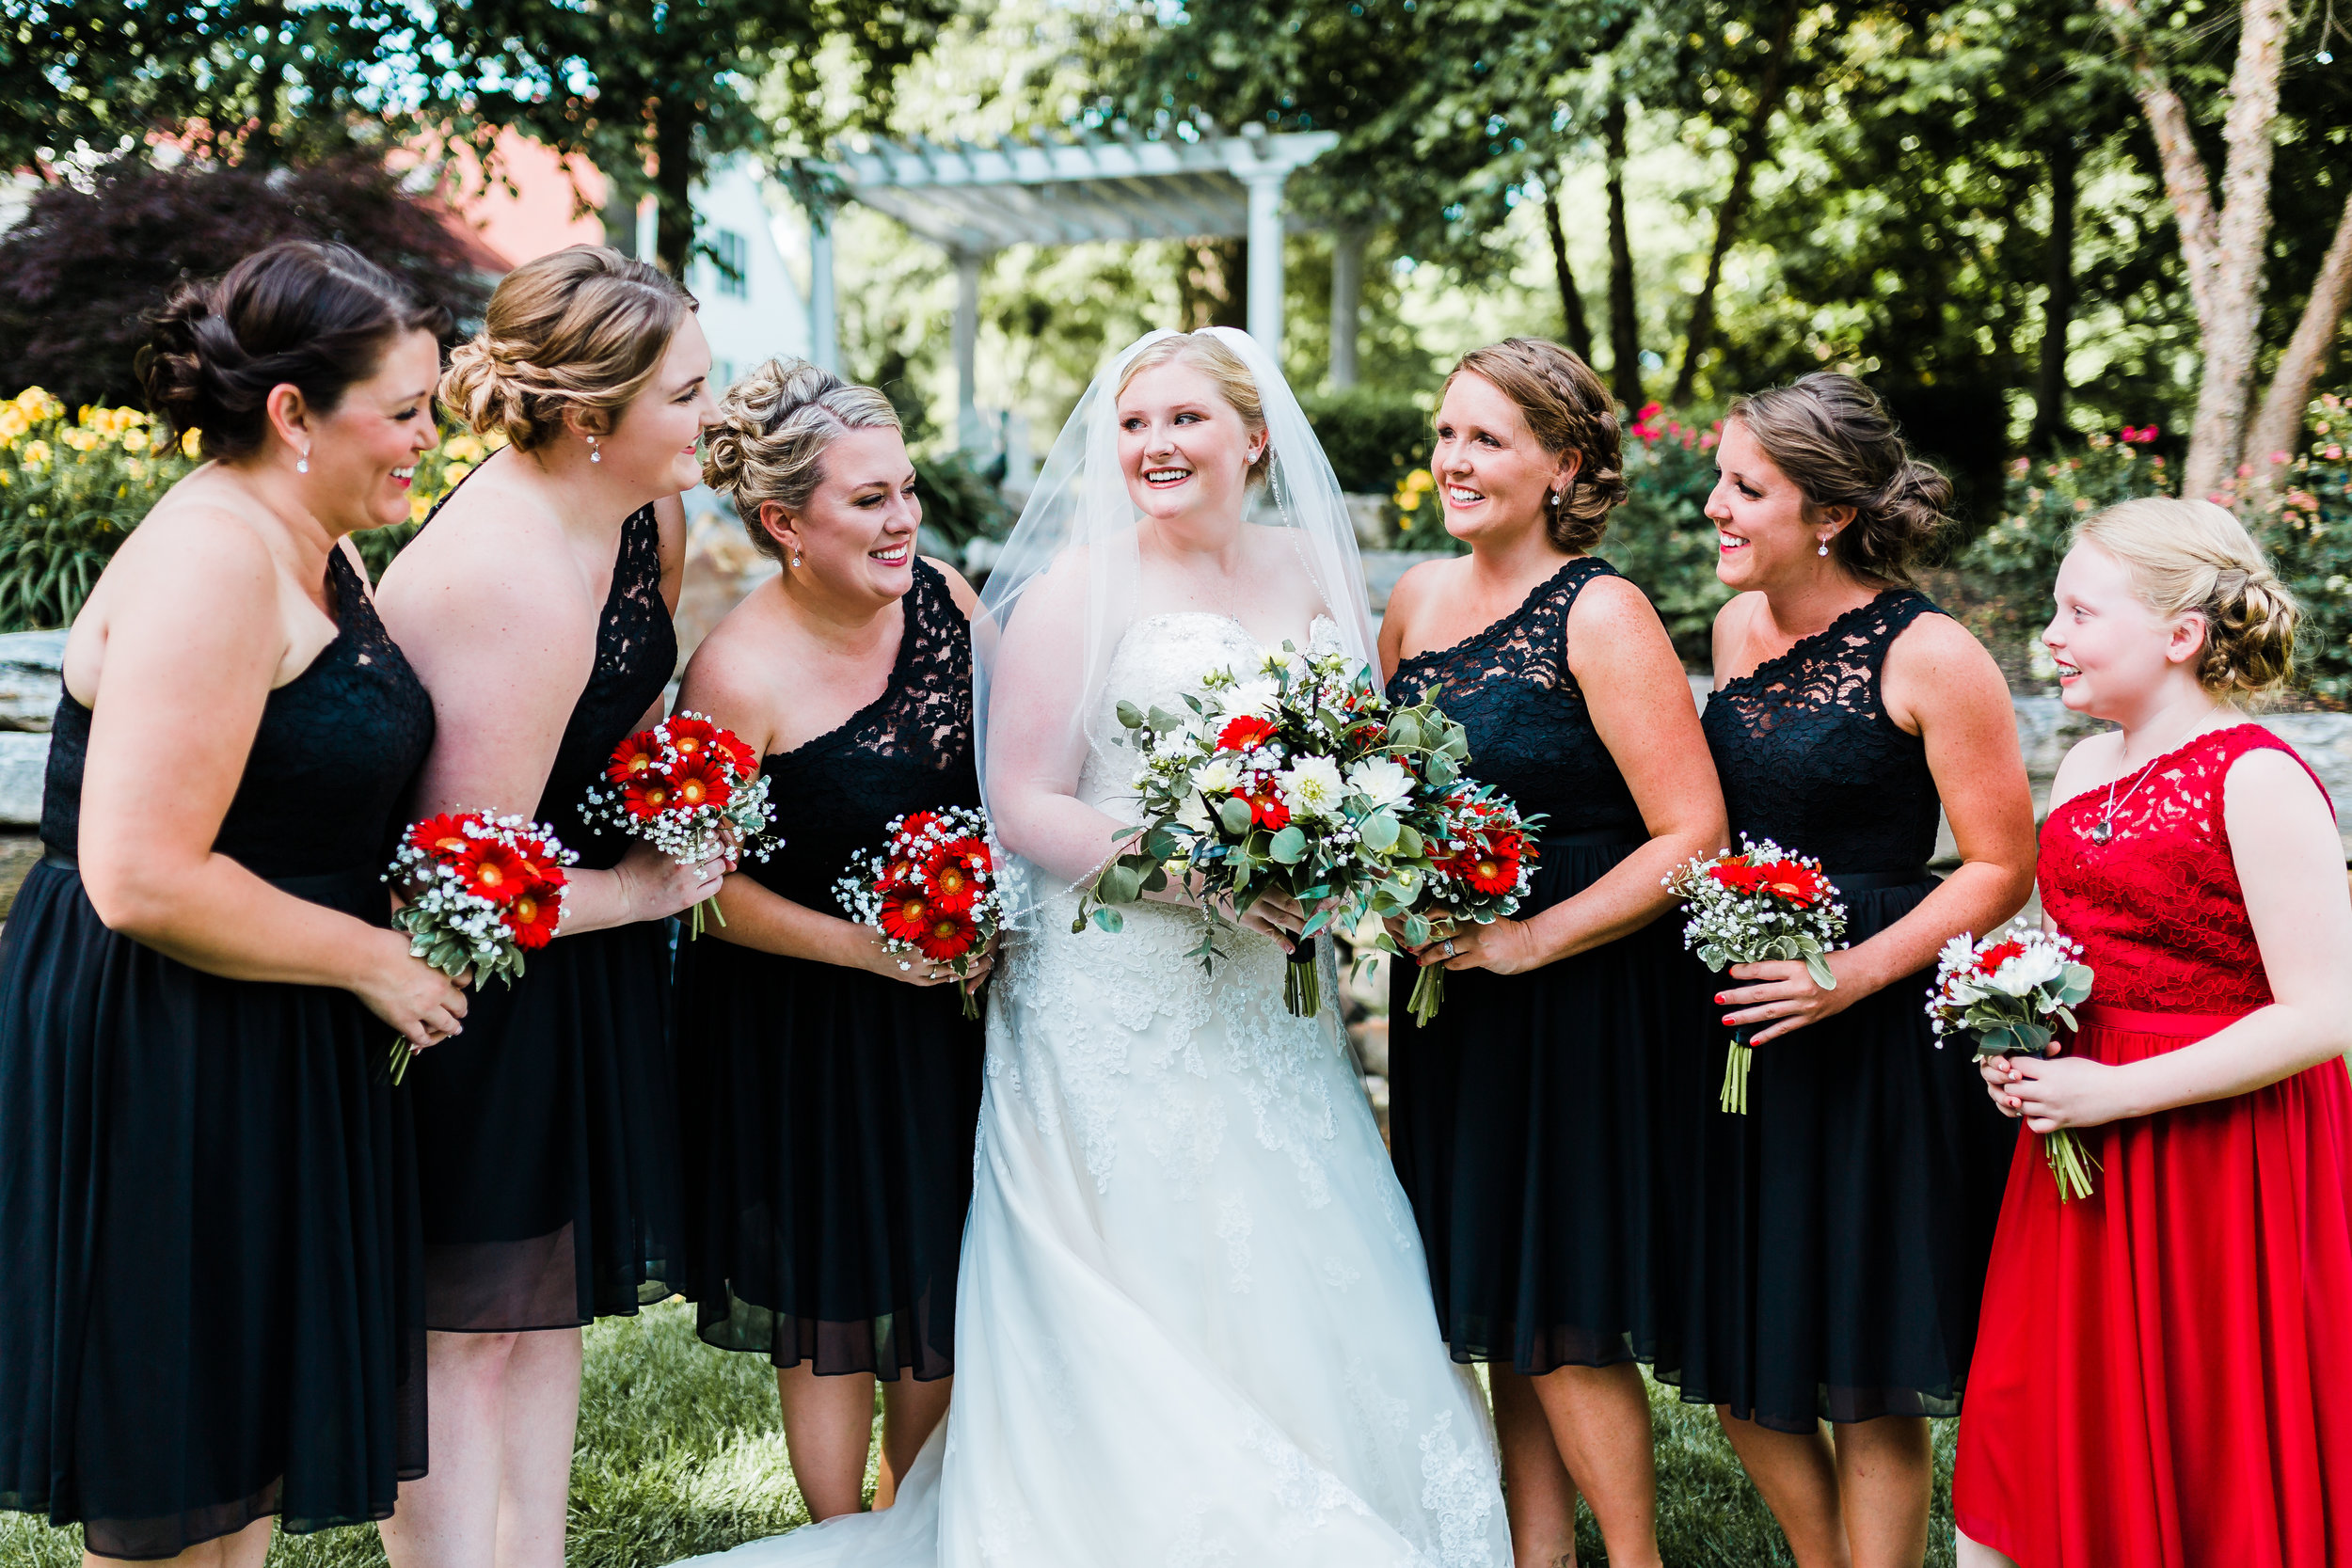 red, white, and black wedding - bride and bridesmaids photos - black bridesmaids dresses - disney inspired wedding - maryland wedding photographer